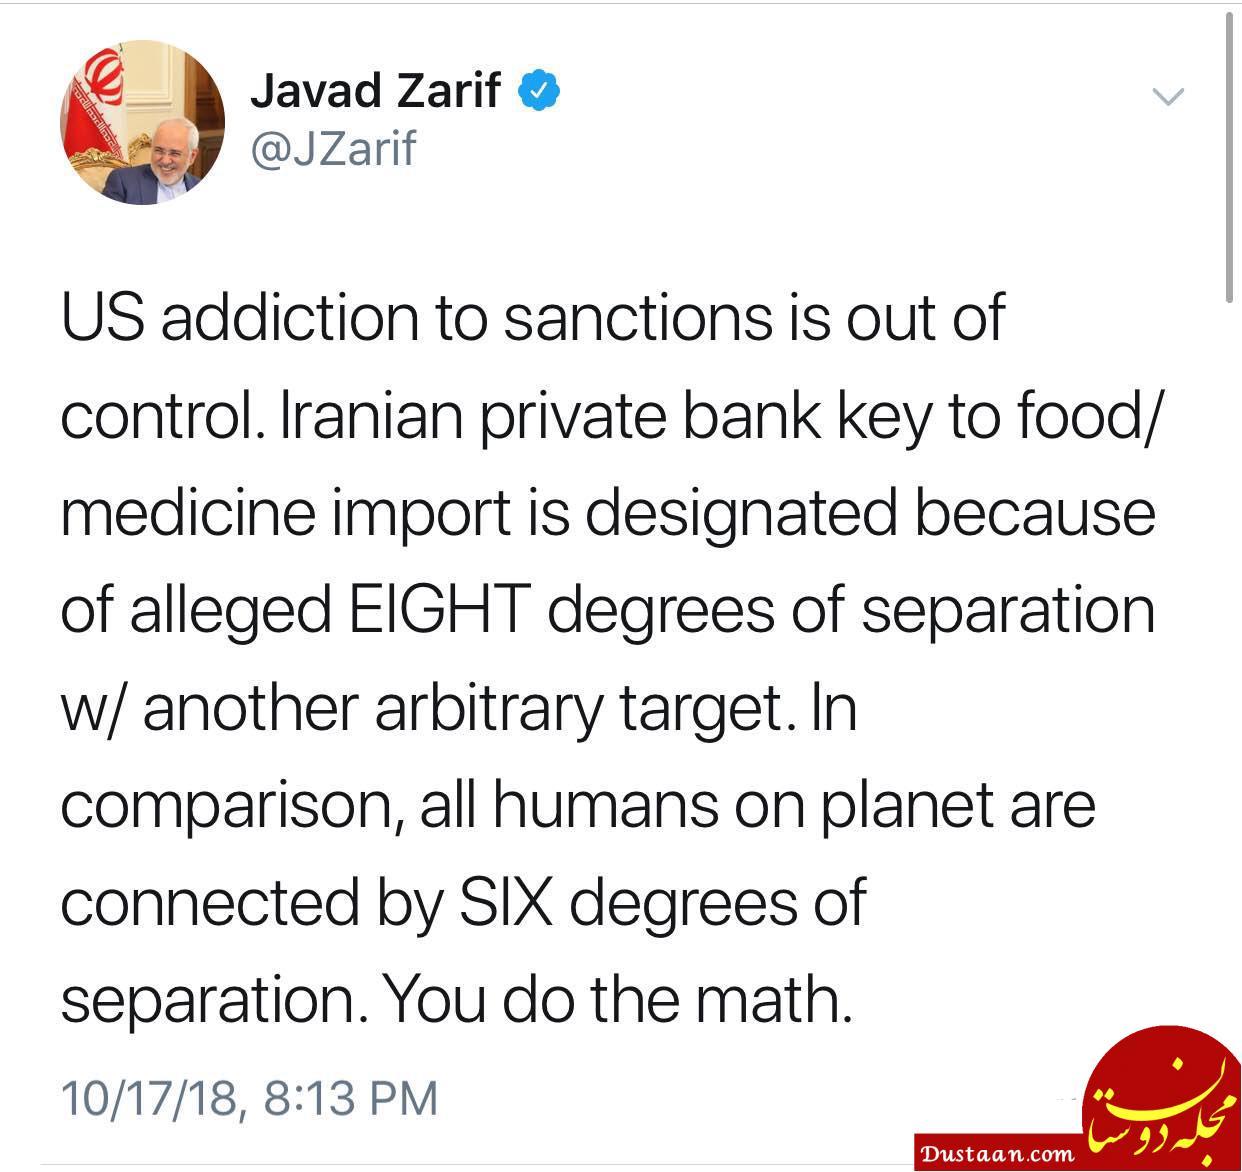 www.dustaan.com ظریف : اعتیاد آمریکا به تحریم، از کنترل خارج شده است